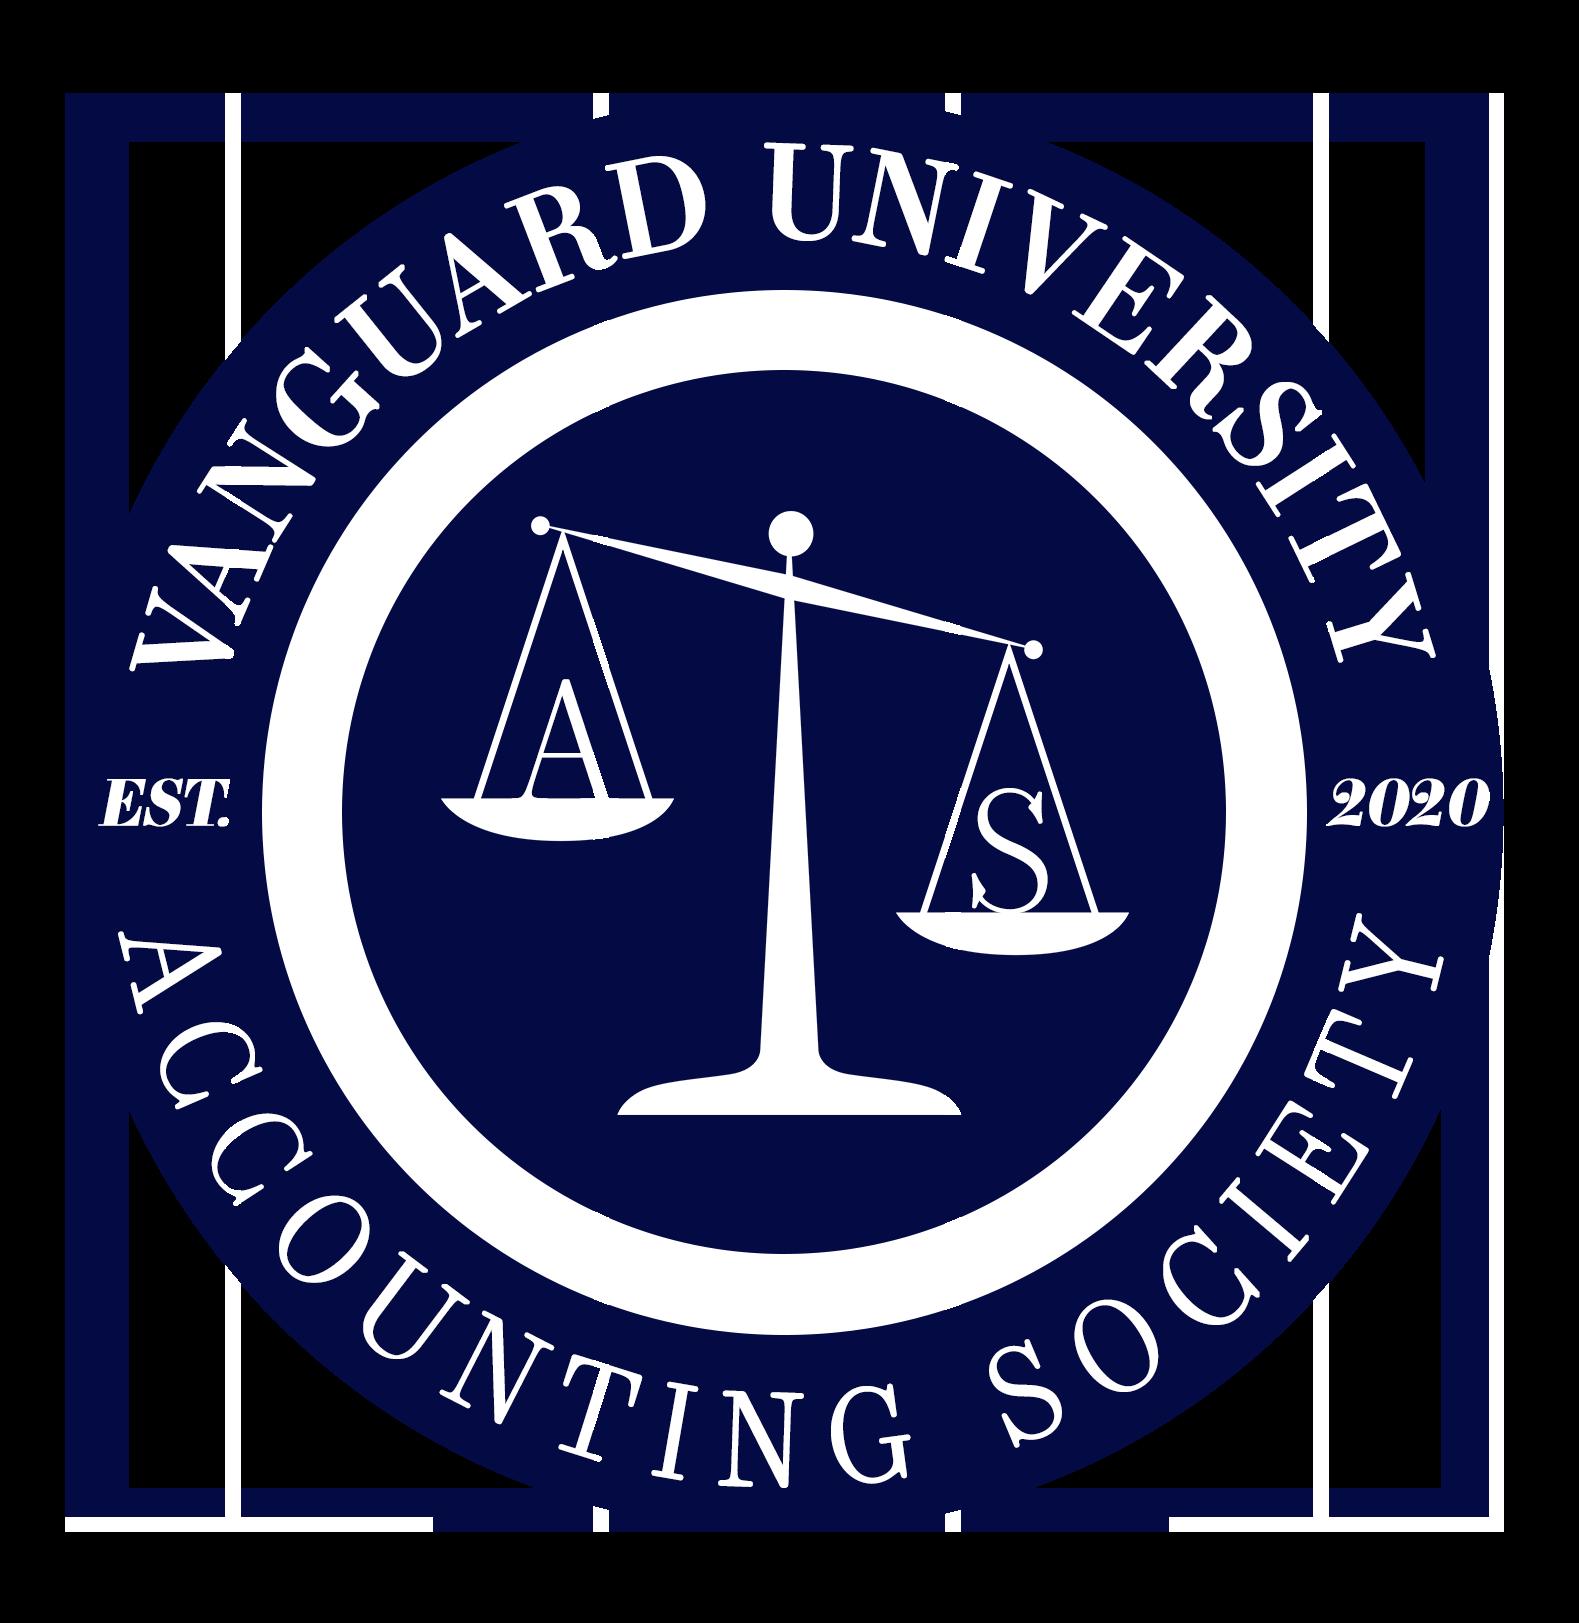 Vanguard University Honor Society